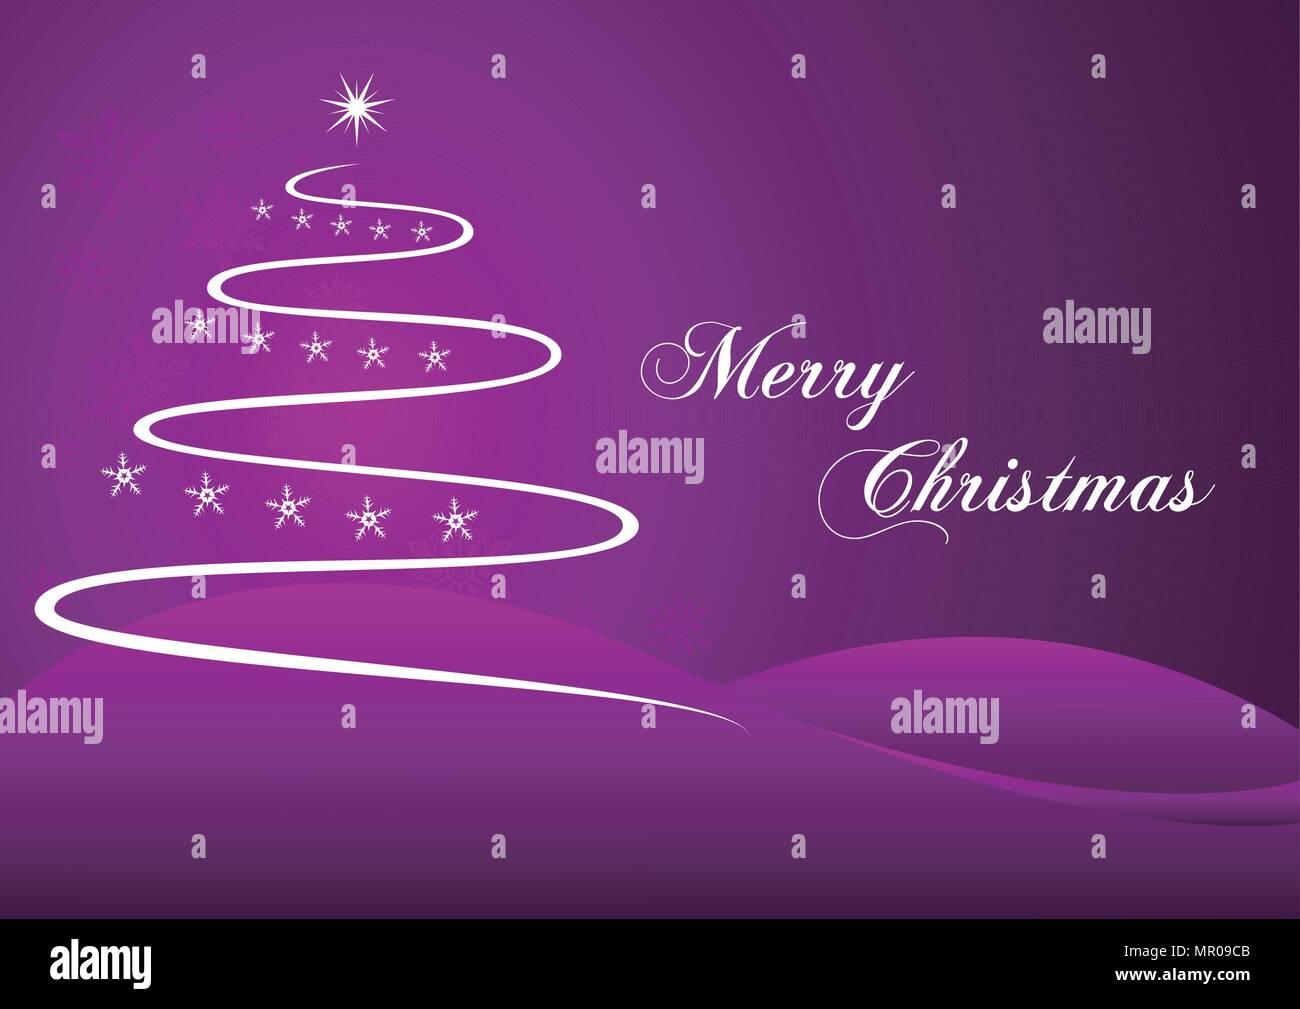 Christmas Background Design.Vector Design Of Merry Christmas Background Decoration Stock